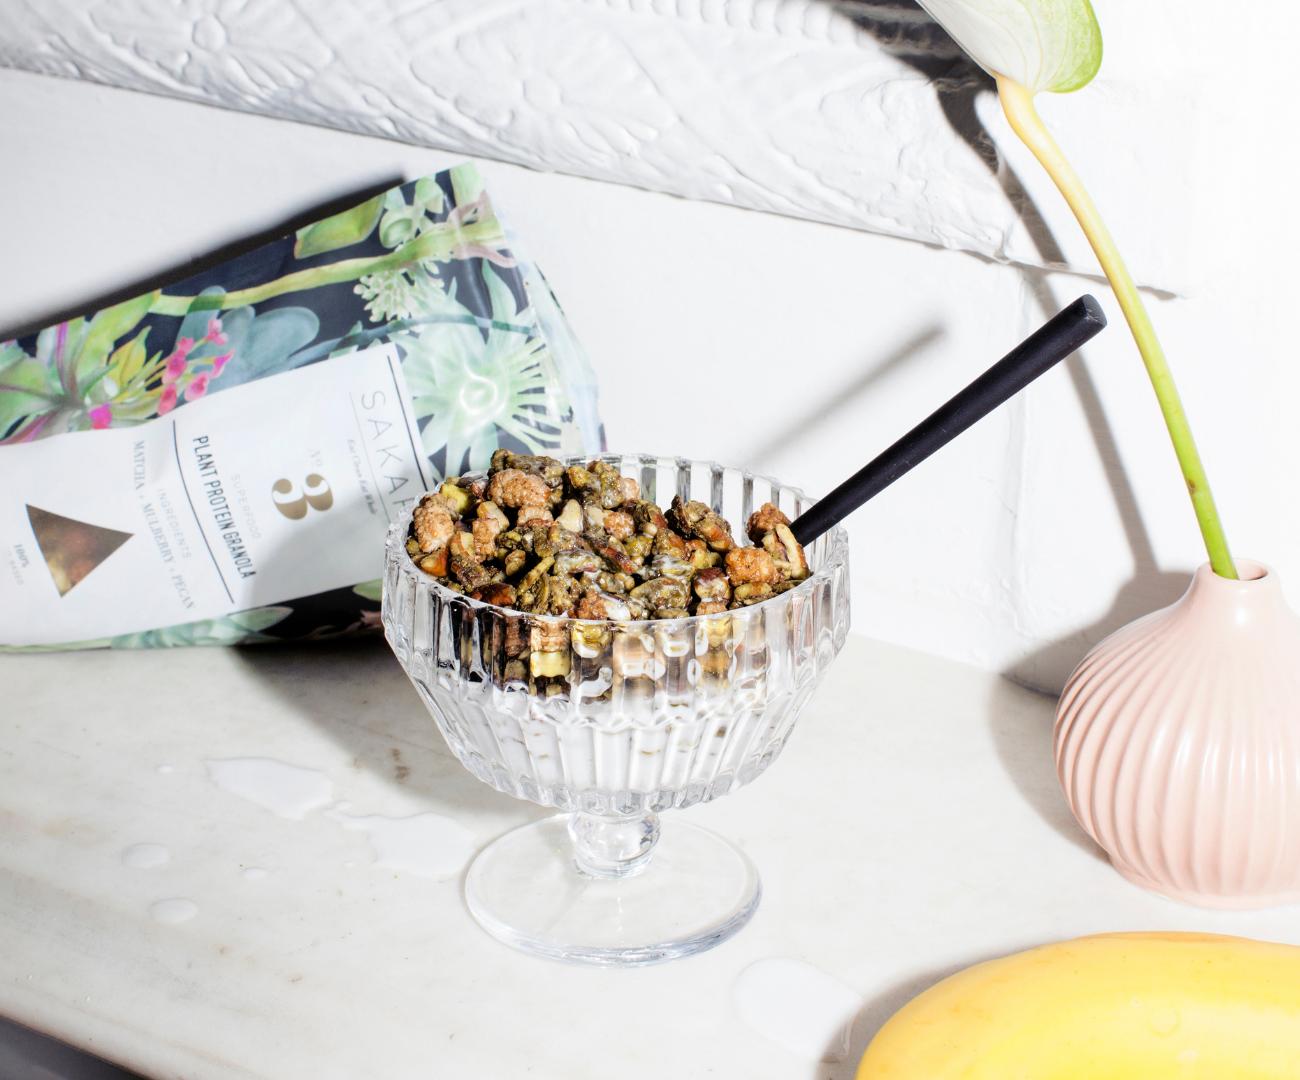 Sakara granola in a glass with milk